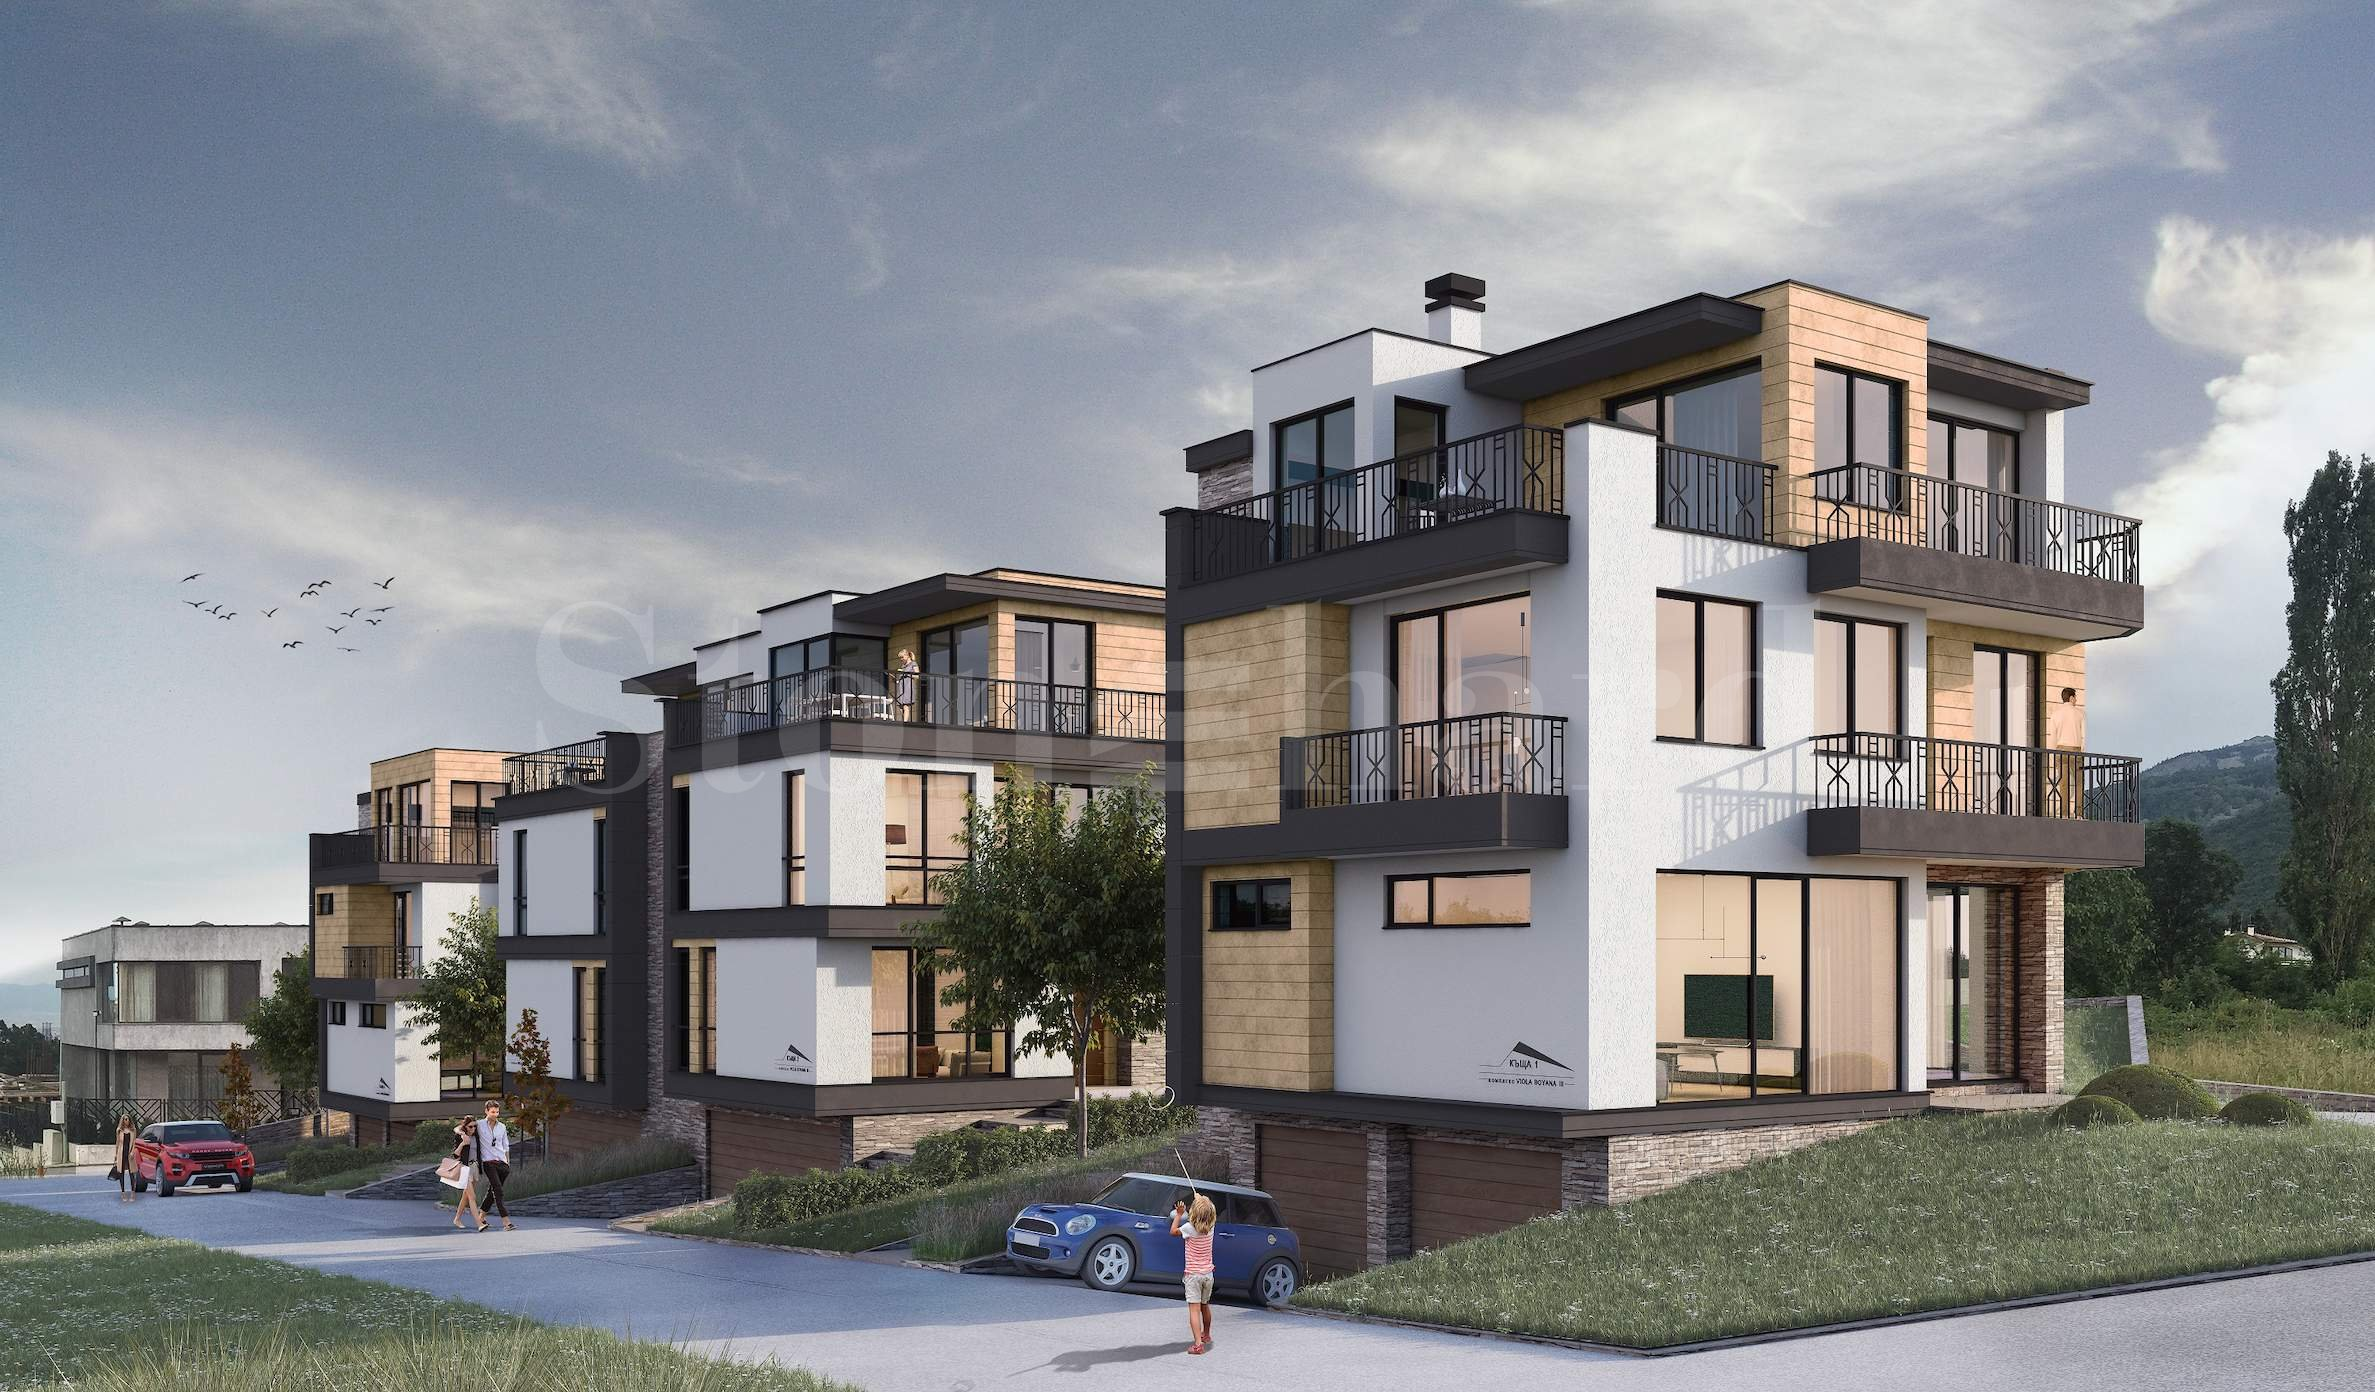 Brand-new luxury 3-storey townhouses close to the Boyana Residence, Sofia1 - Stonehard